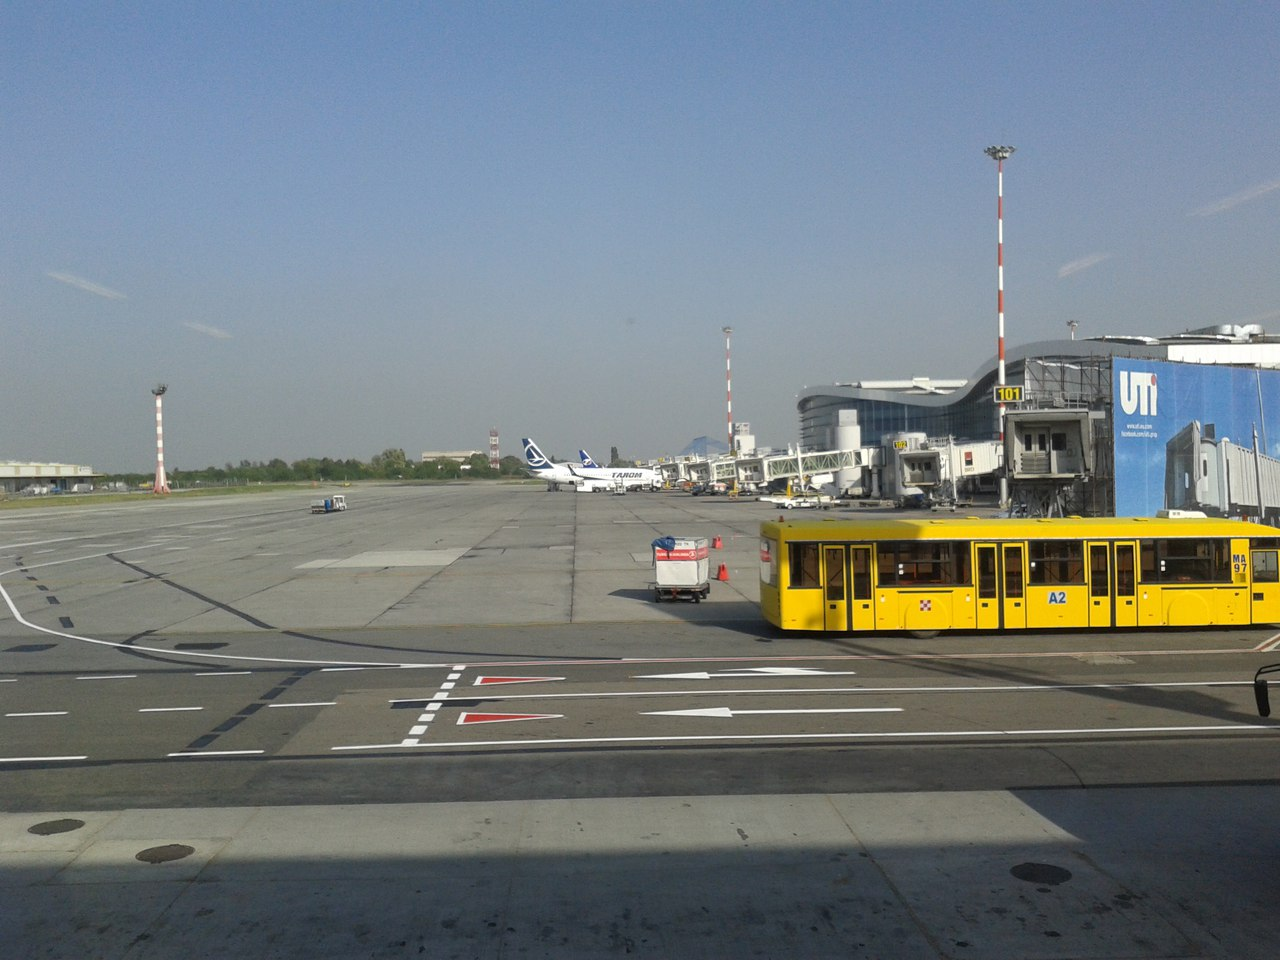 Aeroporto Bucarest : Bucharest airport